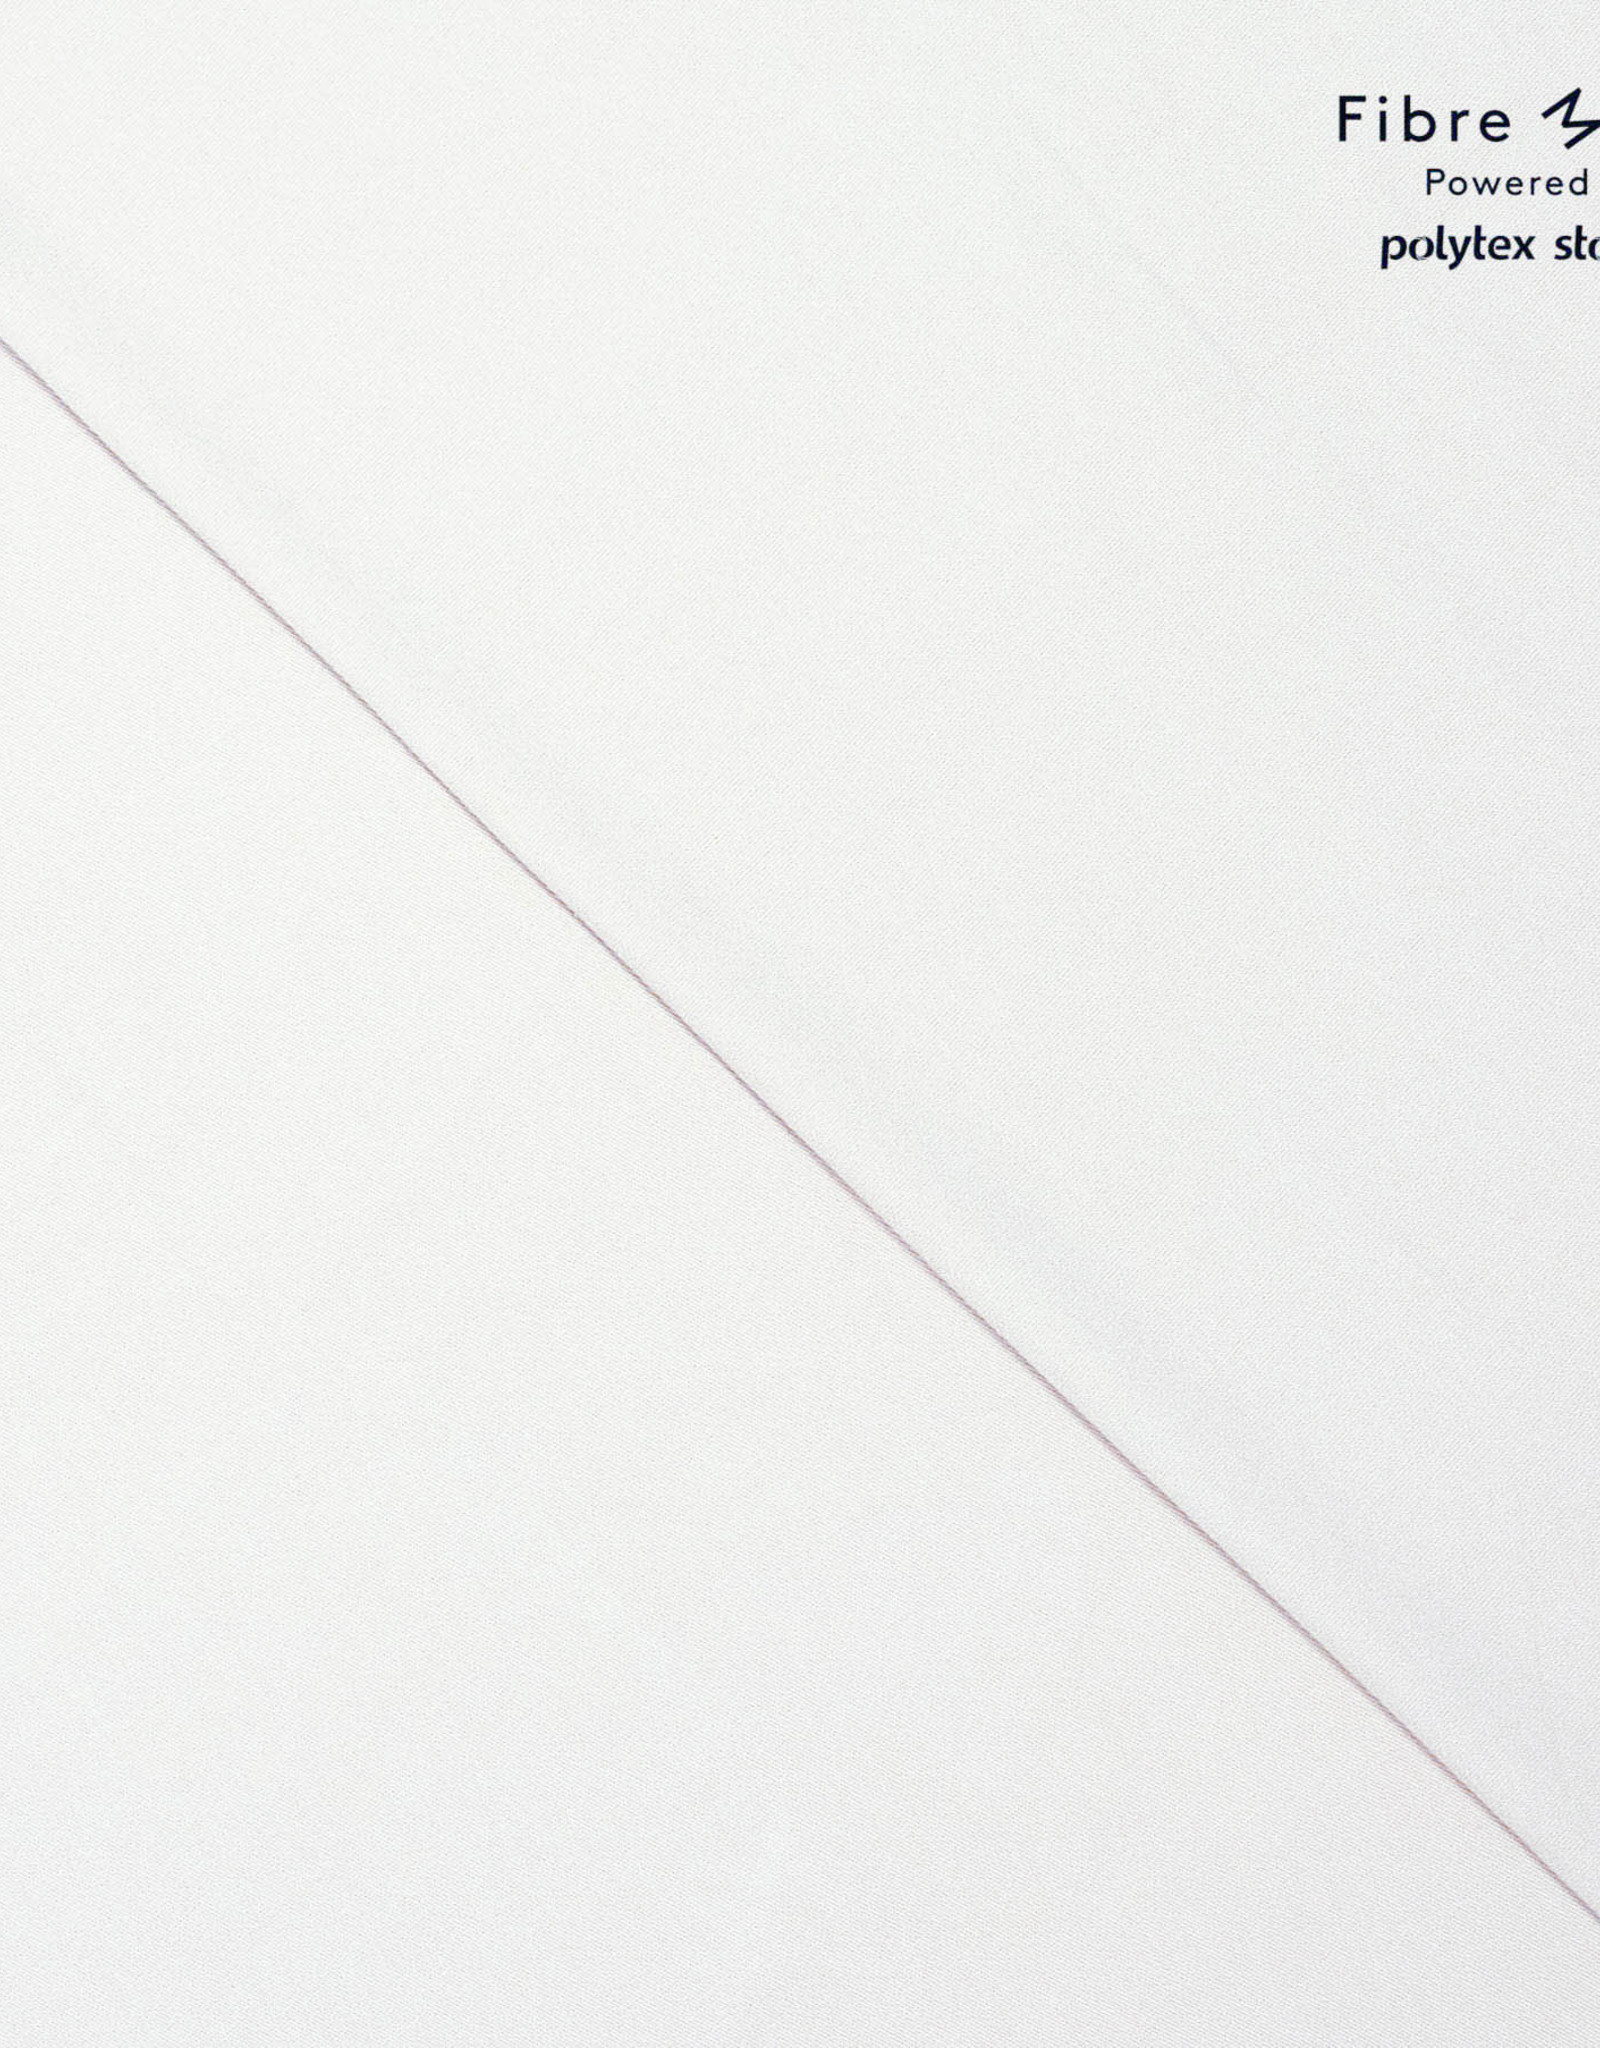 Fibre Mood Fibre Mood ed 14 Woven Denim elastisch Gebroken wit Maya